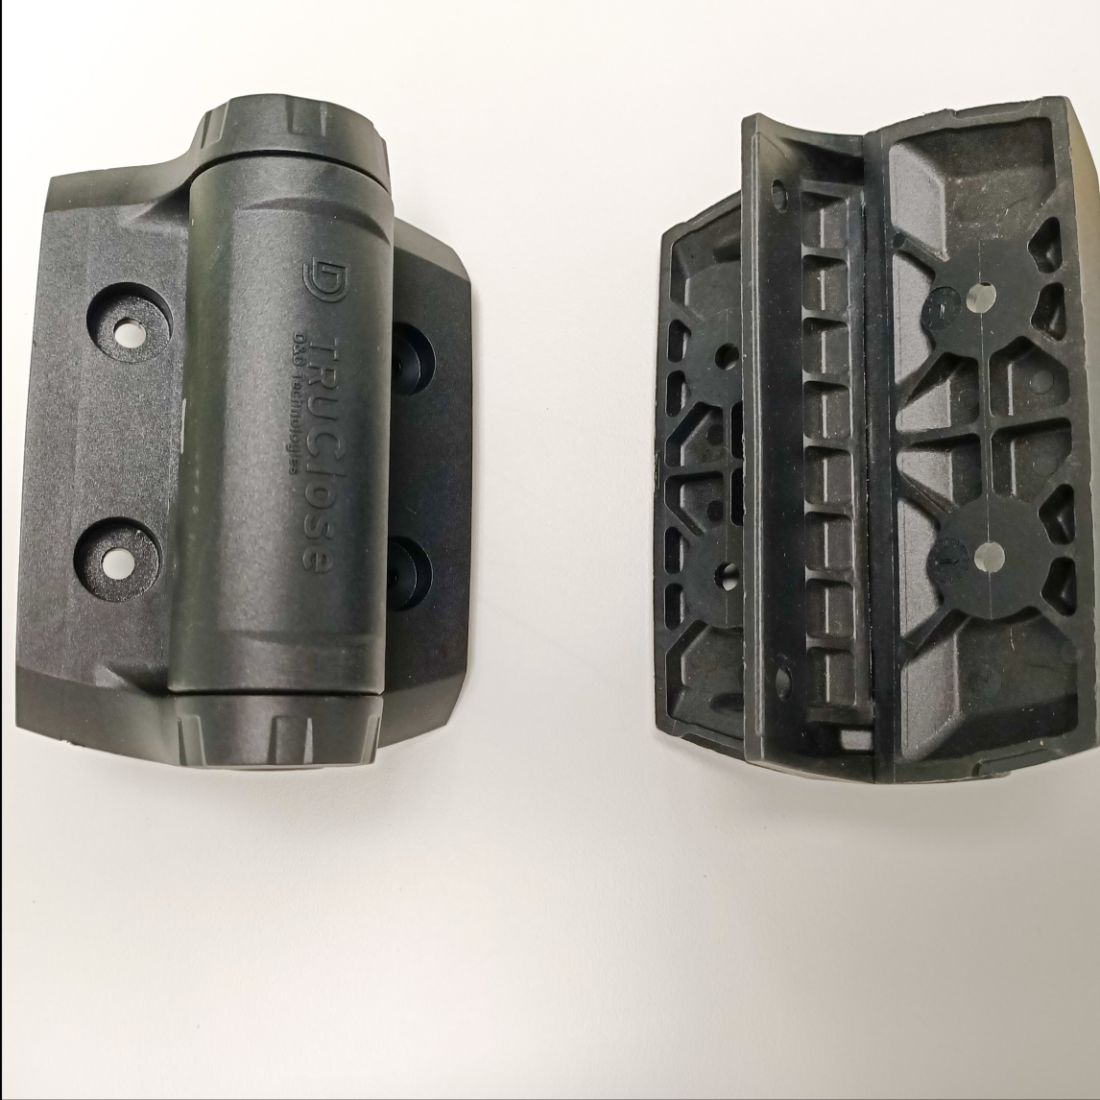 R Range Heavy Duty Pedestrain Gate Hinge Charcoal Black ELI-GATE-HVY-DHINGE